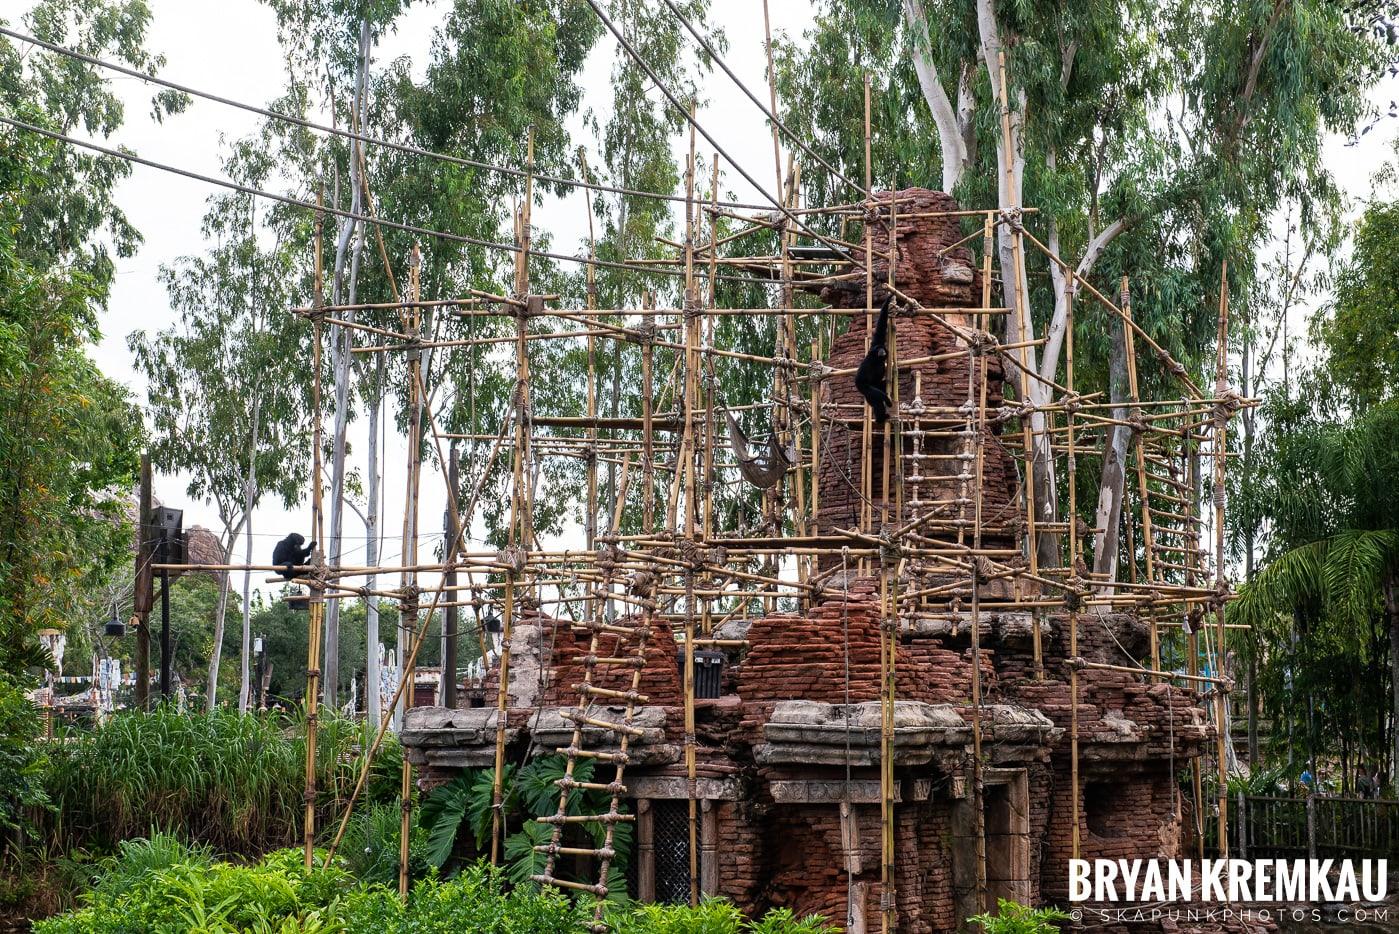 Walt Disney World Vacation: Day 5 (Animal Kingdom / Disney's Hollywood Studios) - 10.3.19 (55)